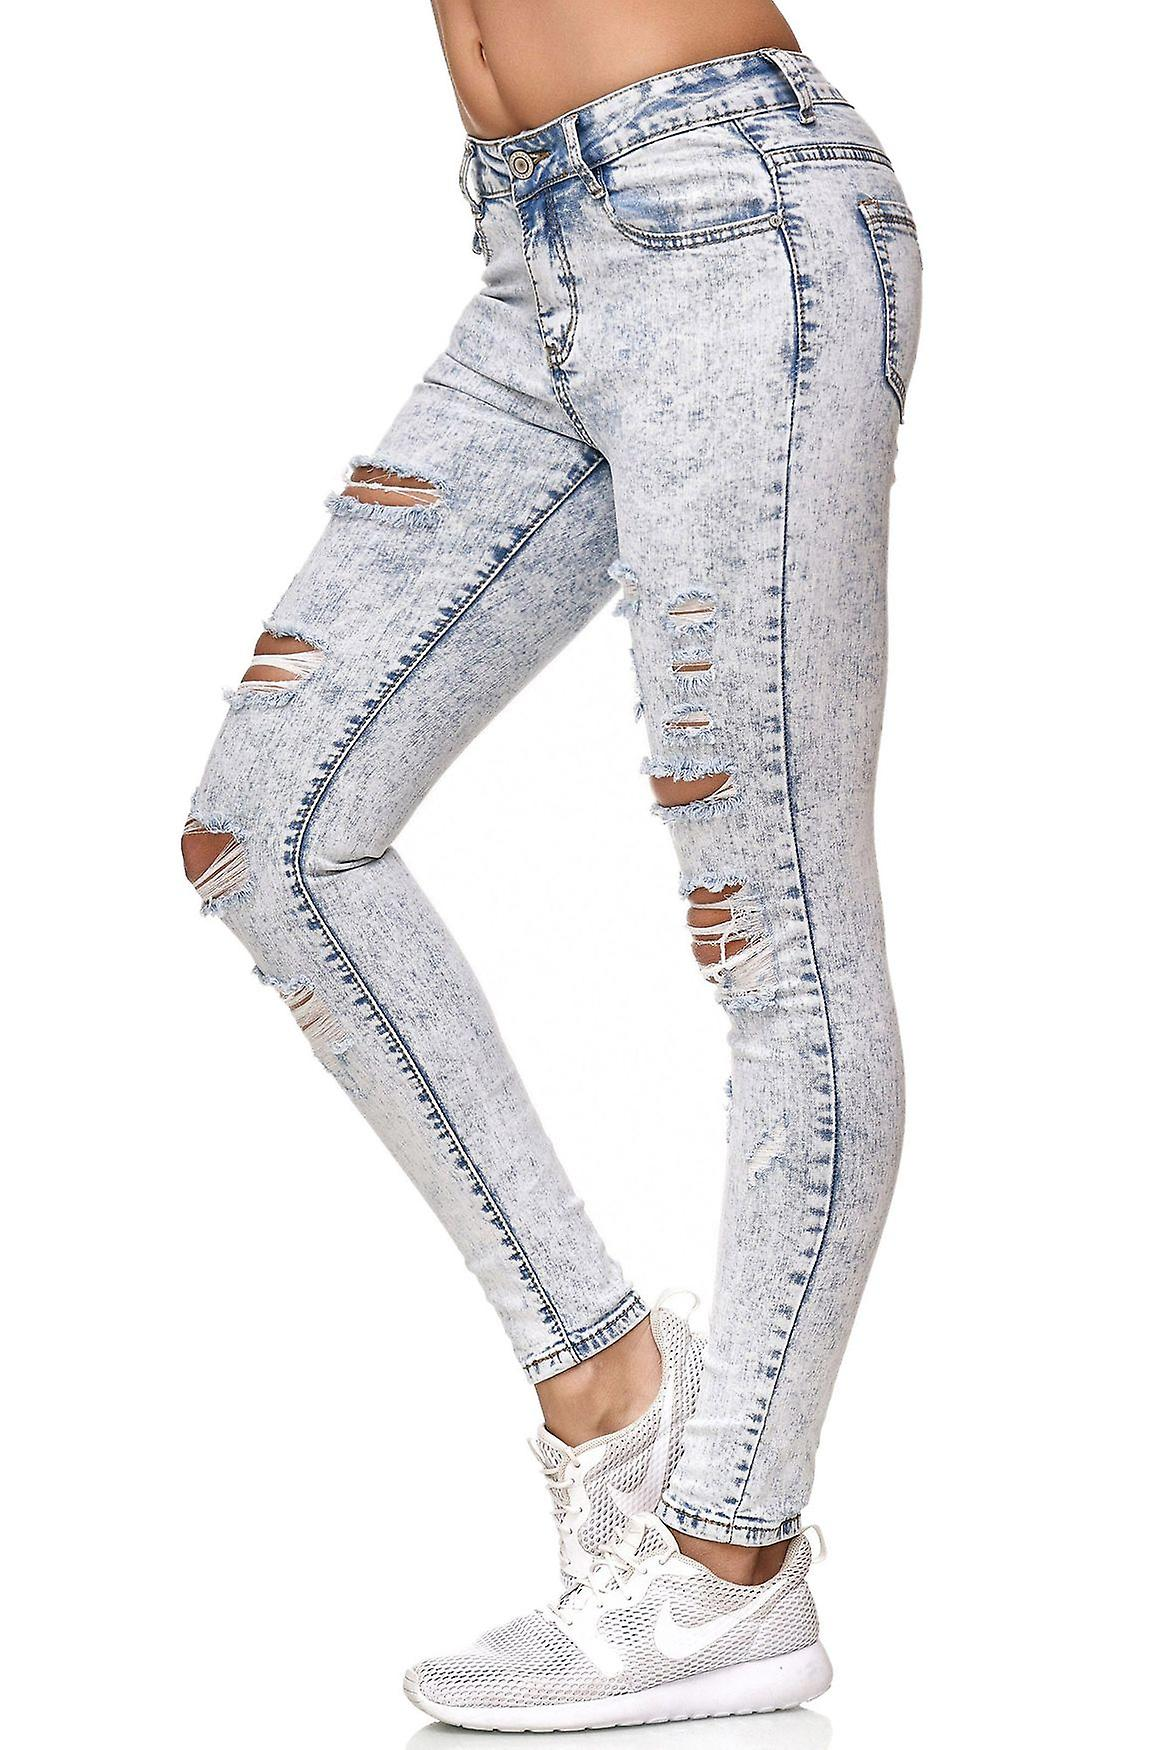 Women Yoga Pants❤️Foncircle Hedgehog Printed Leggings Sports Fitness Trousers